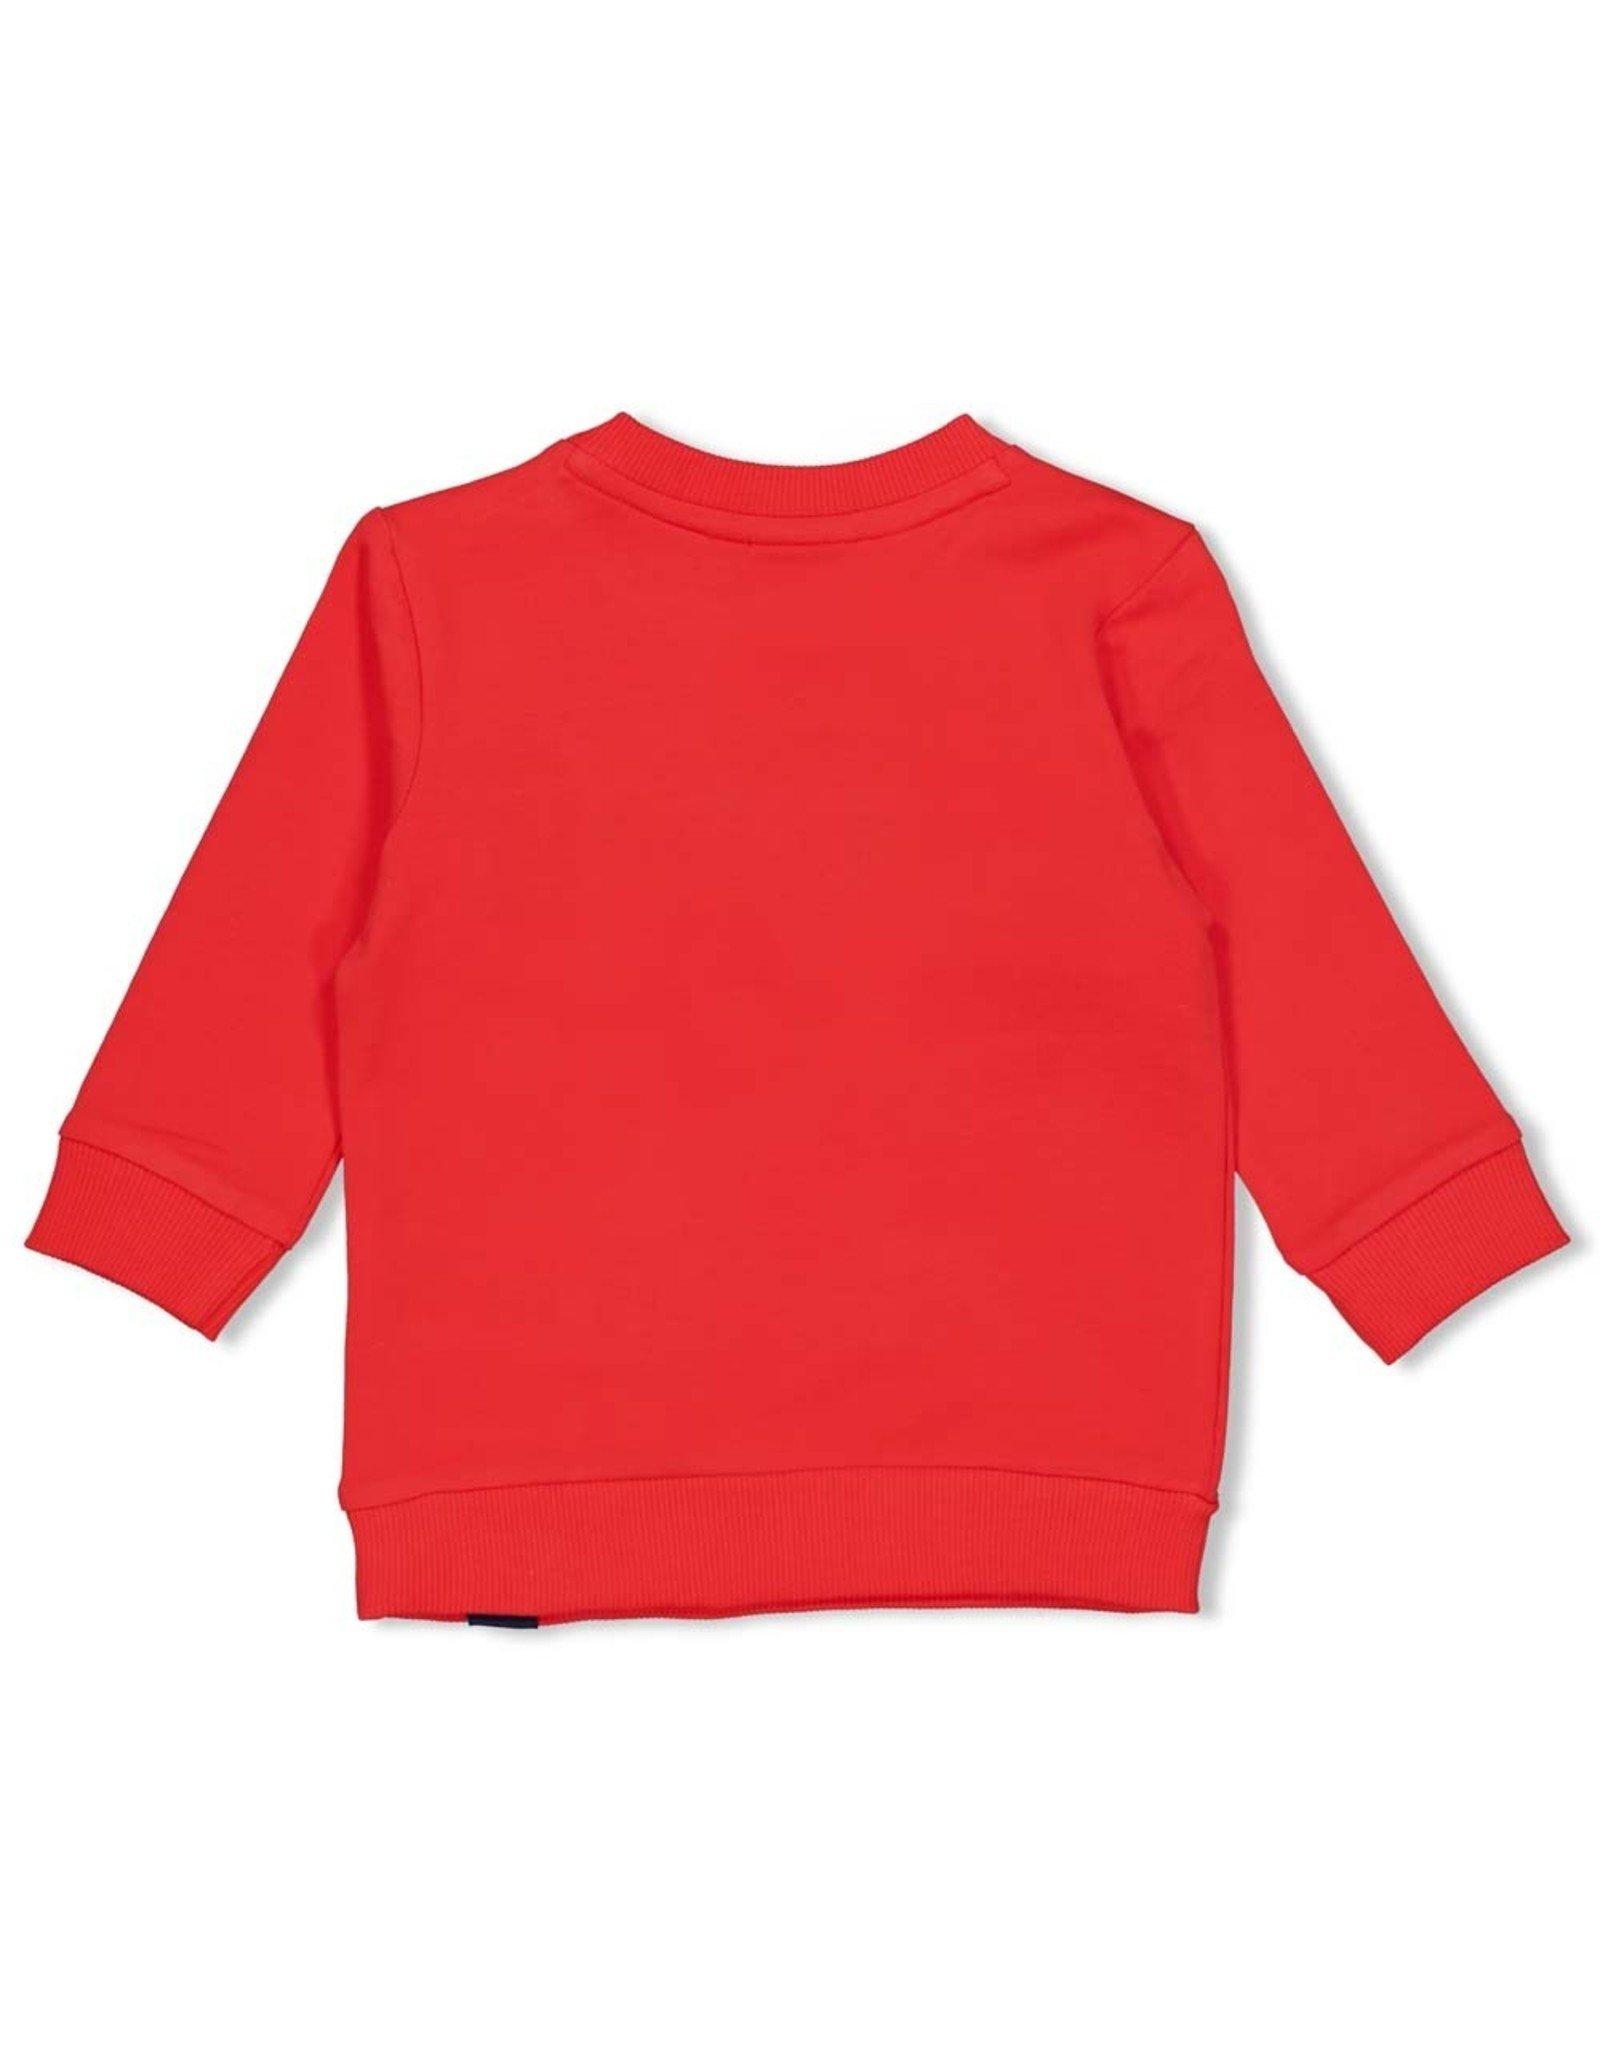 Feetje Sweater - Playground Rood